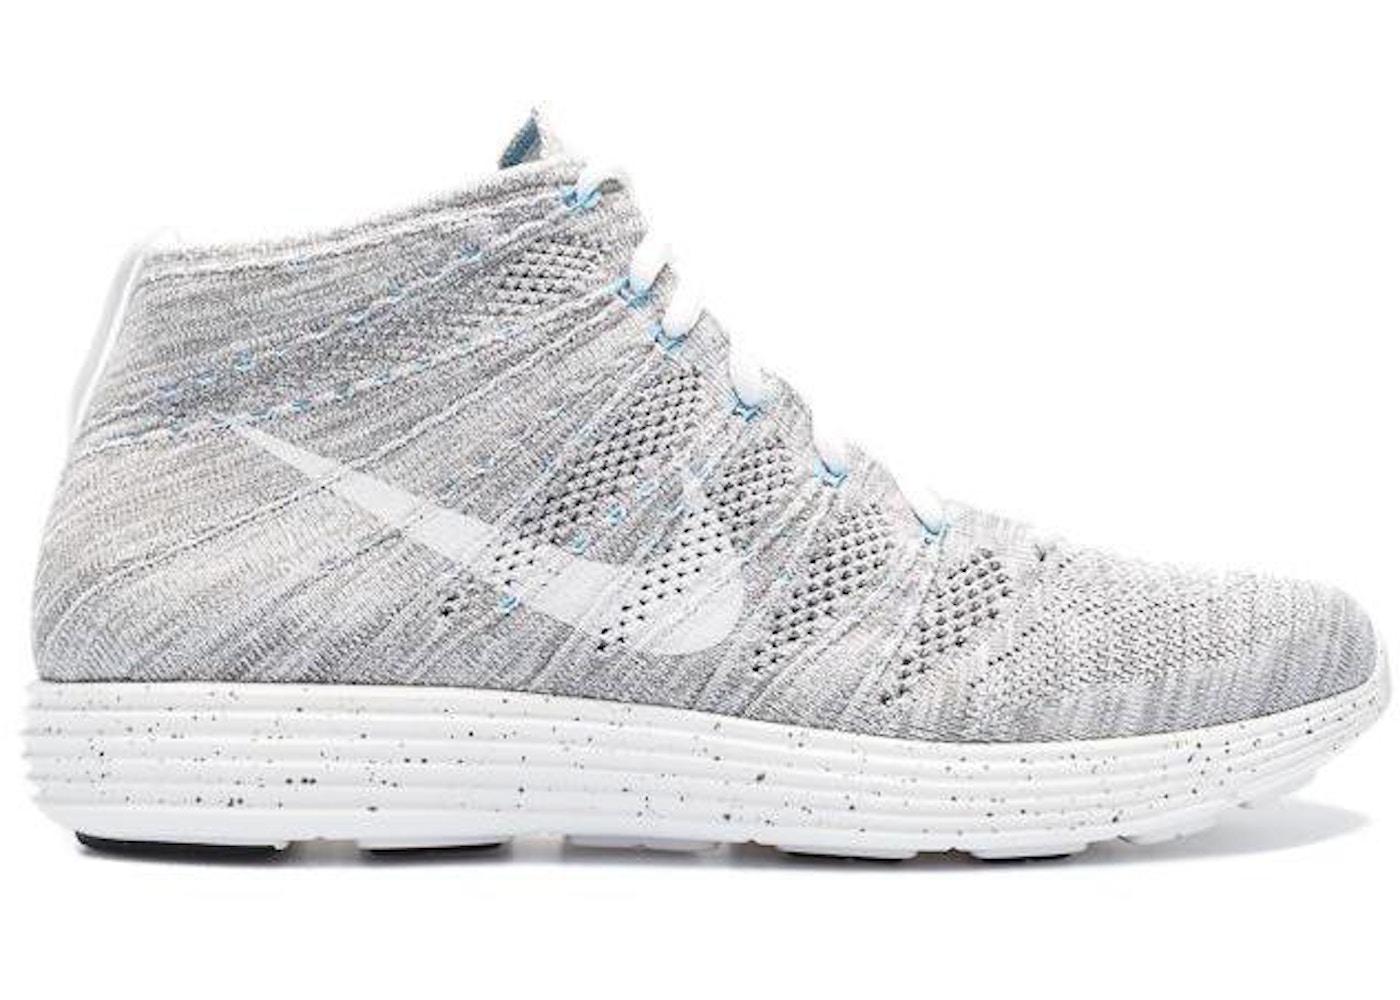 online retailer 8063e b79cb Nike Lunar Flyknit Chukka HTM Snow Pack Grey